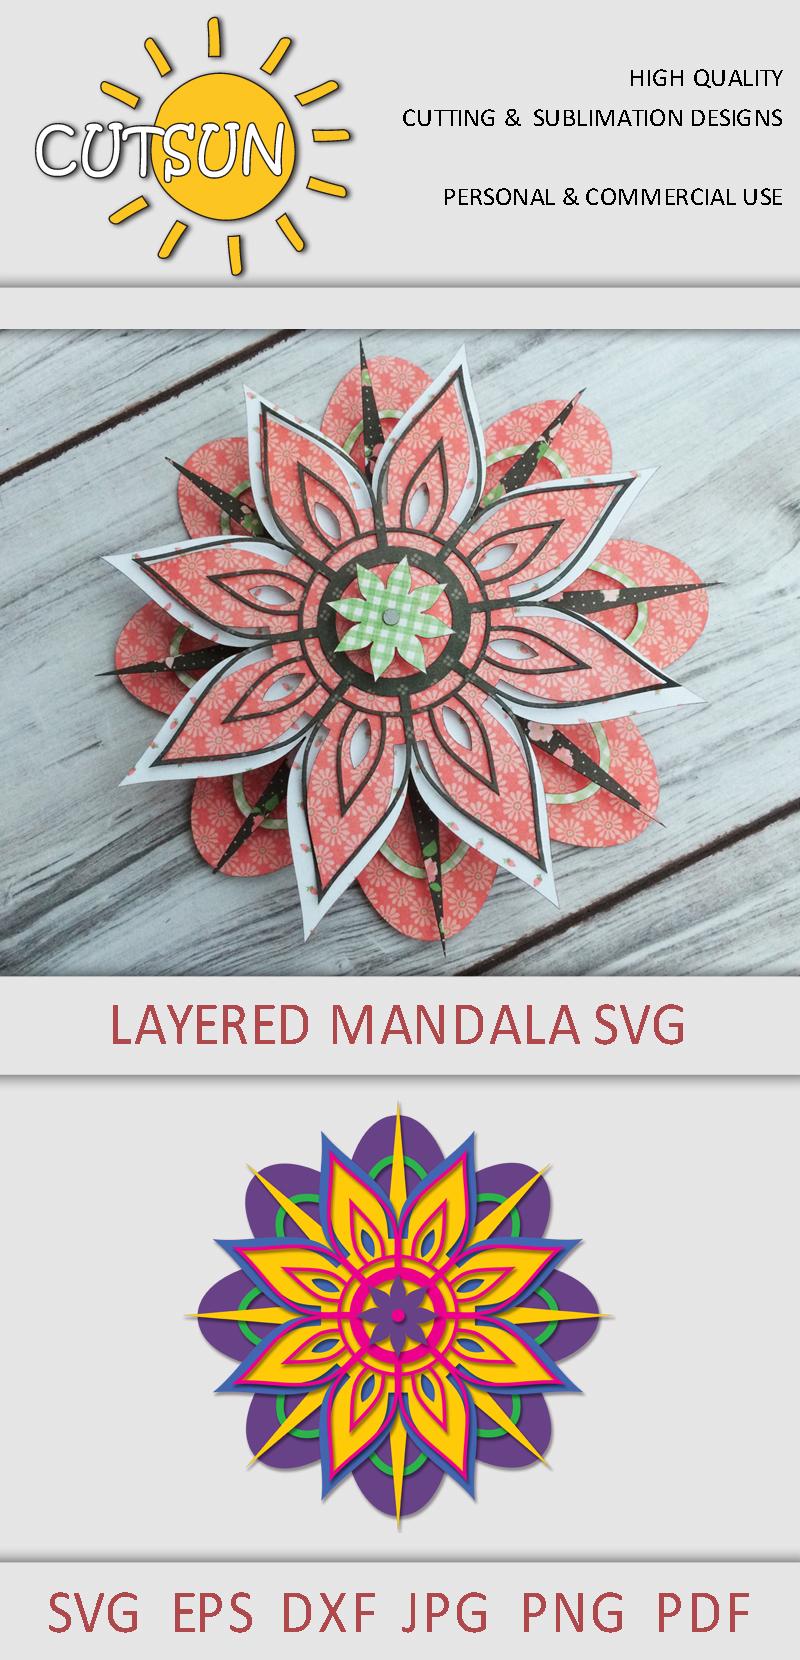 Download Mandala SVG   3D Layered Mandala SVG cut file 8 layers